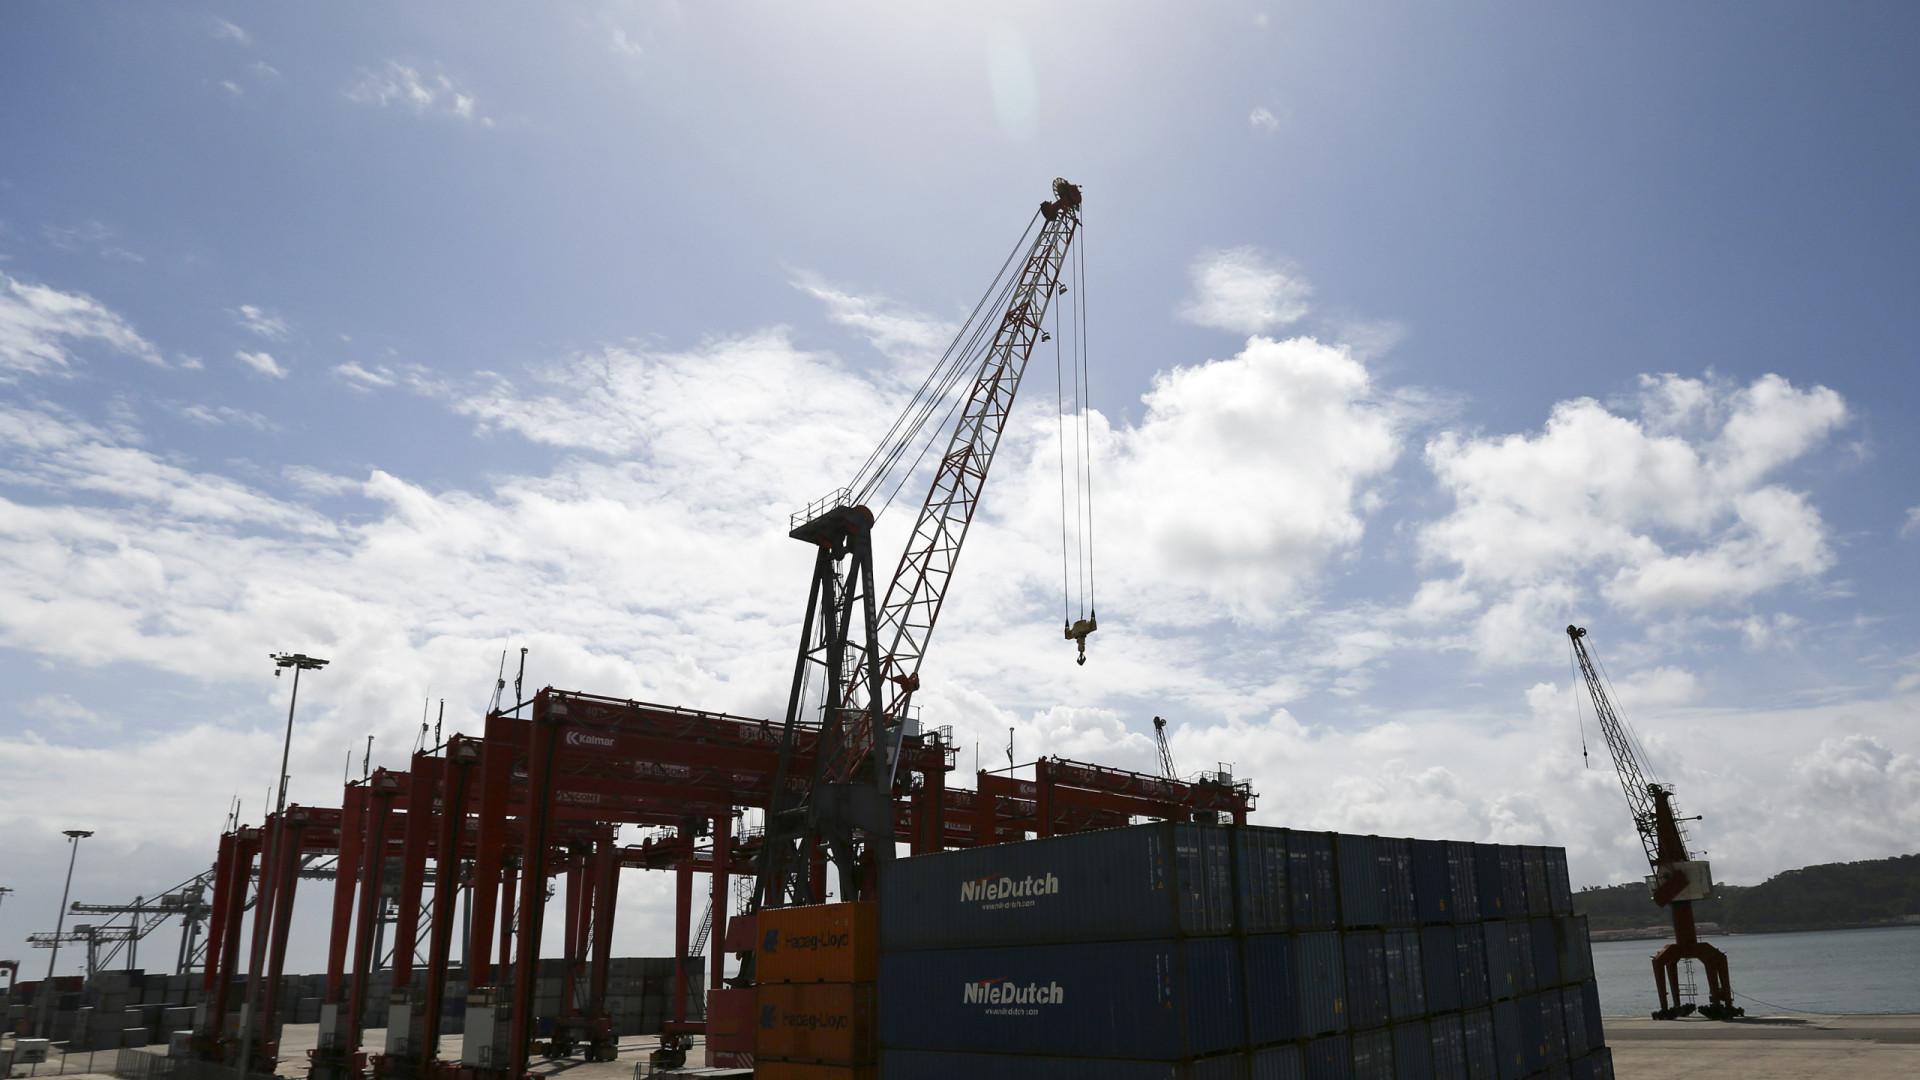 Sindicato anuncia acordo e suspende greve no porto do Caniçal